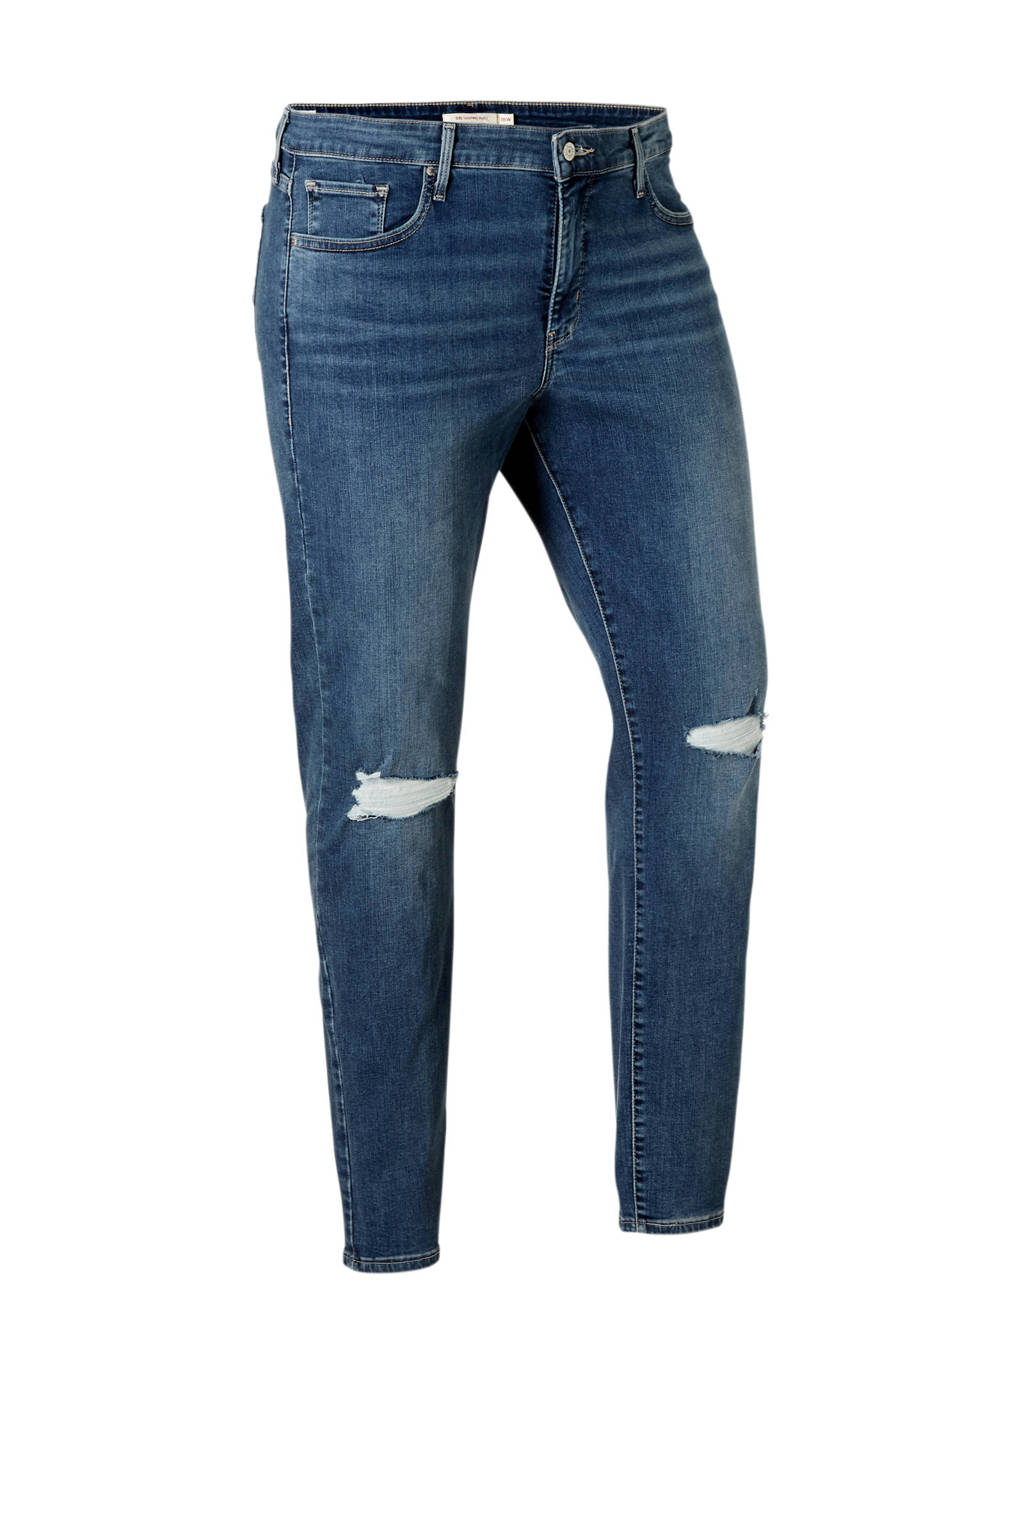 Levi's Plus shaping skinny jeans, Dark denim